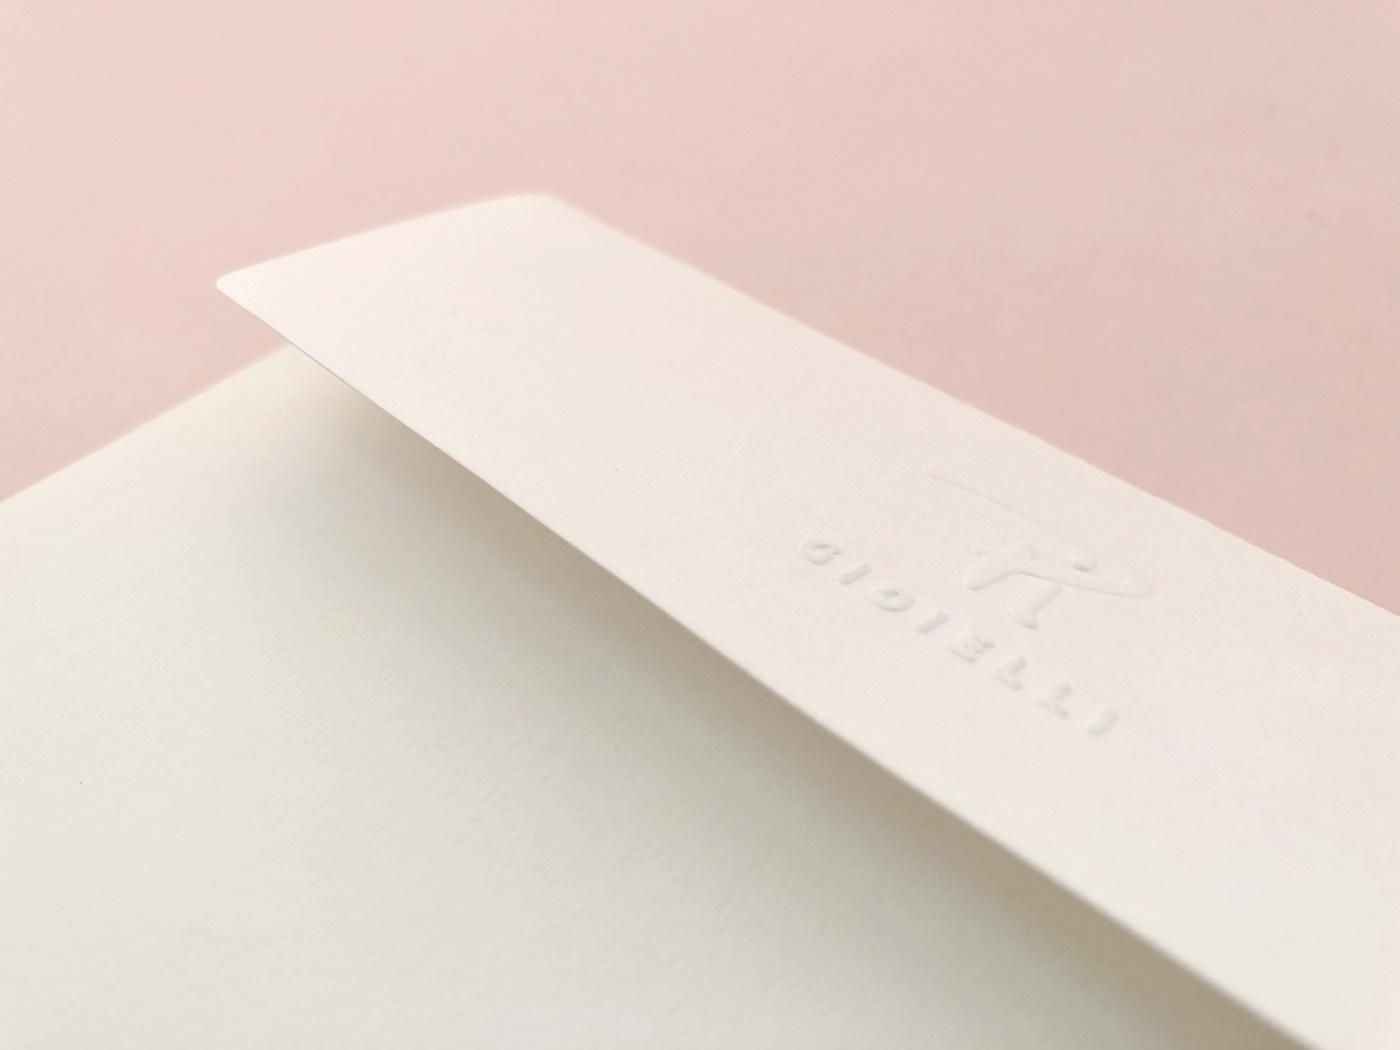 jewels branding  logo brand identity Packaging Shopper business card print envelope Pack